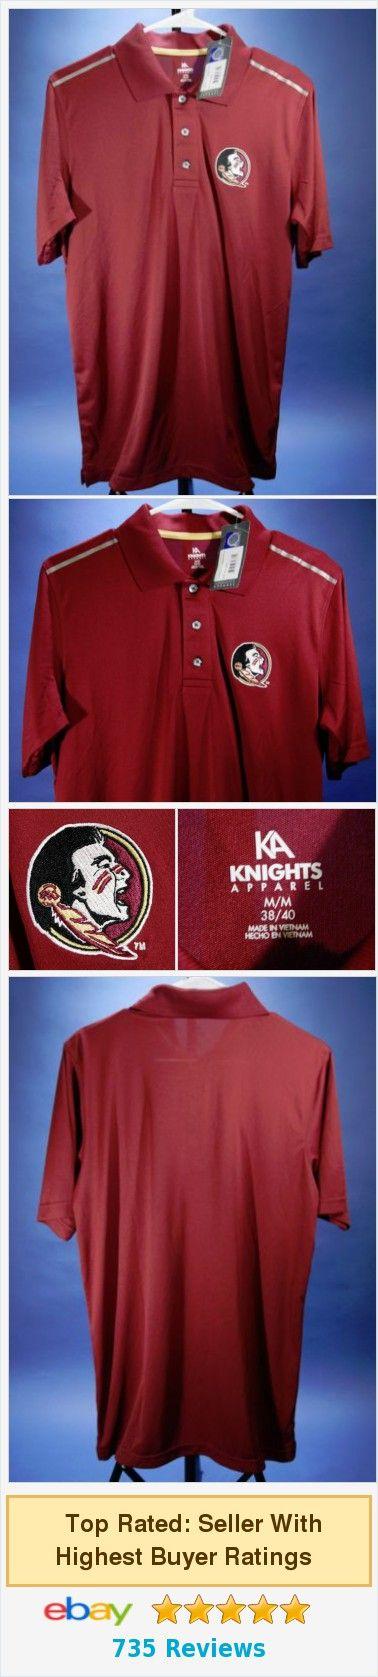 Men's Florida State Seminoles NCAA Polo Shirt NEW Medium 38/40 KA Red  | eBay